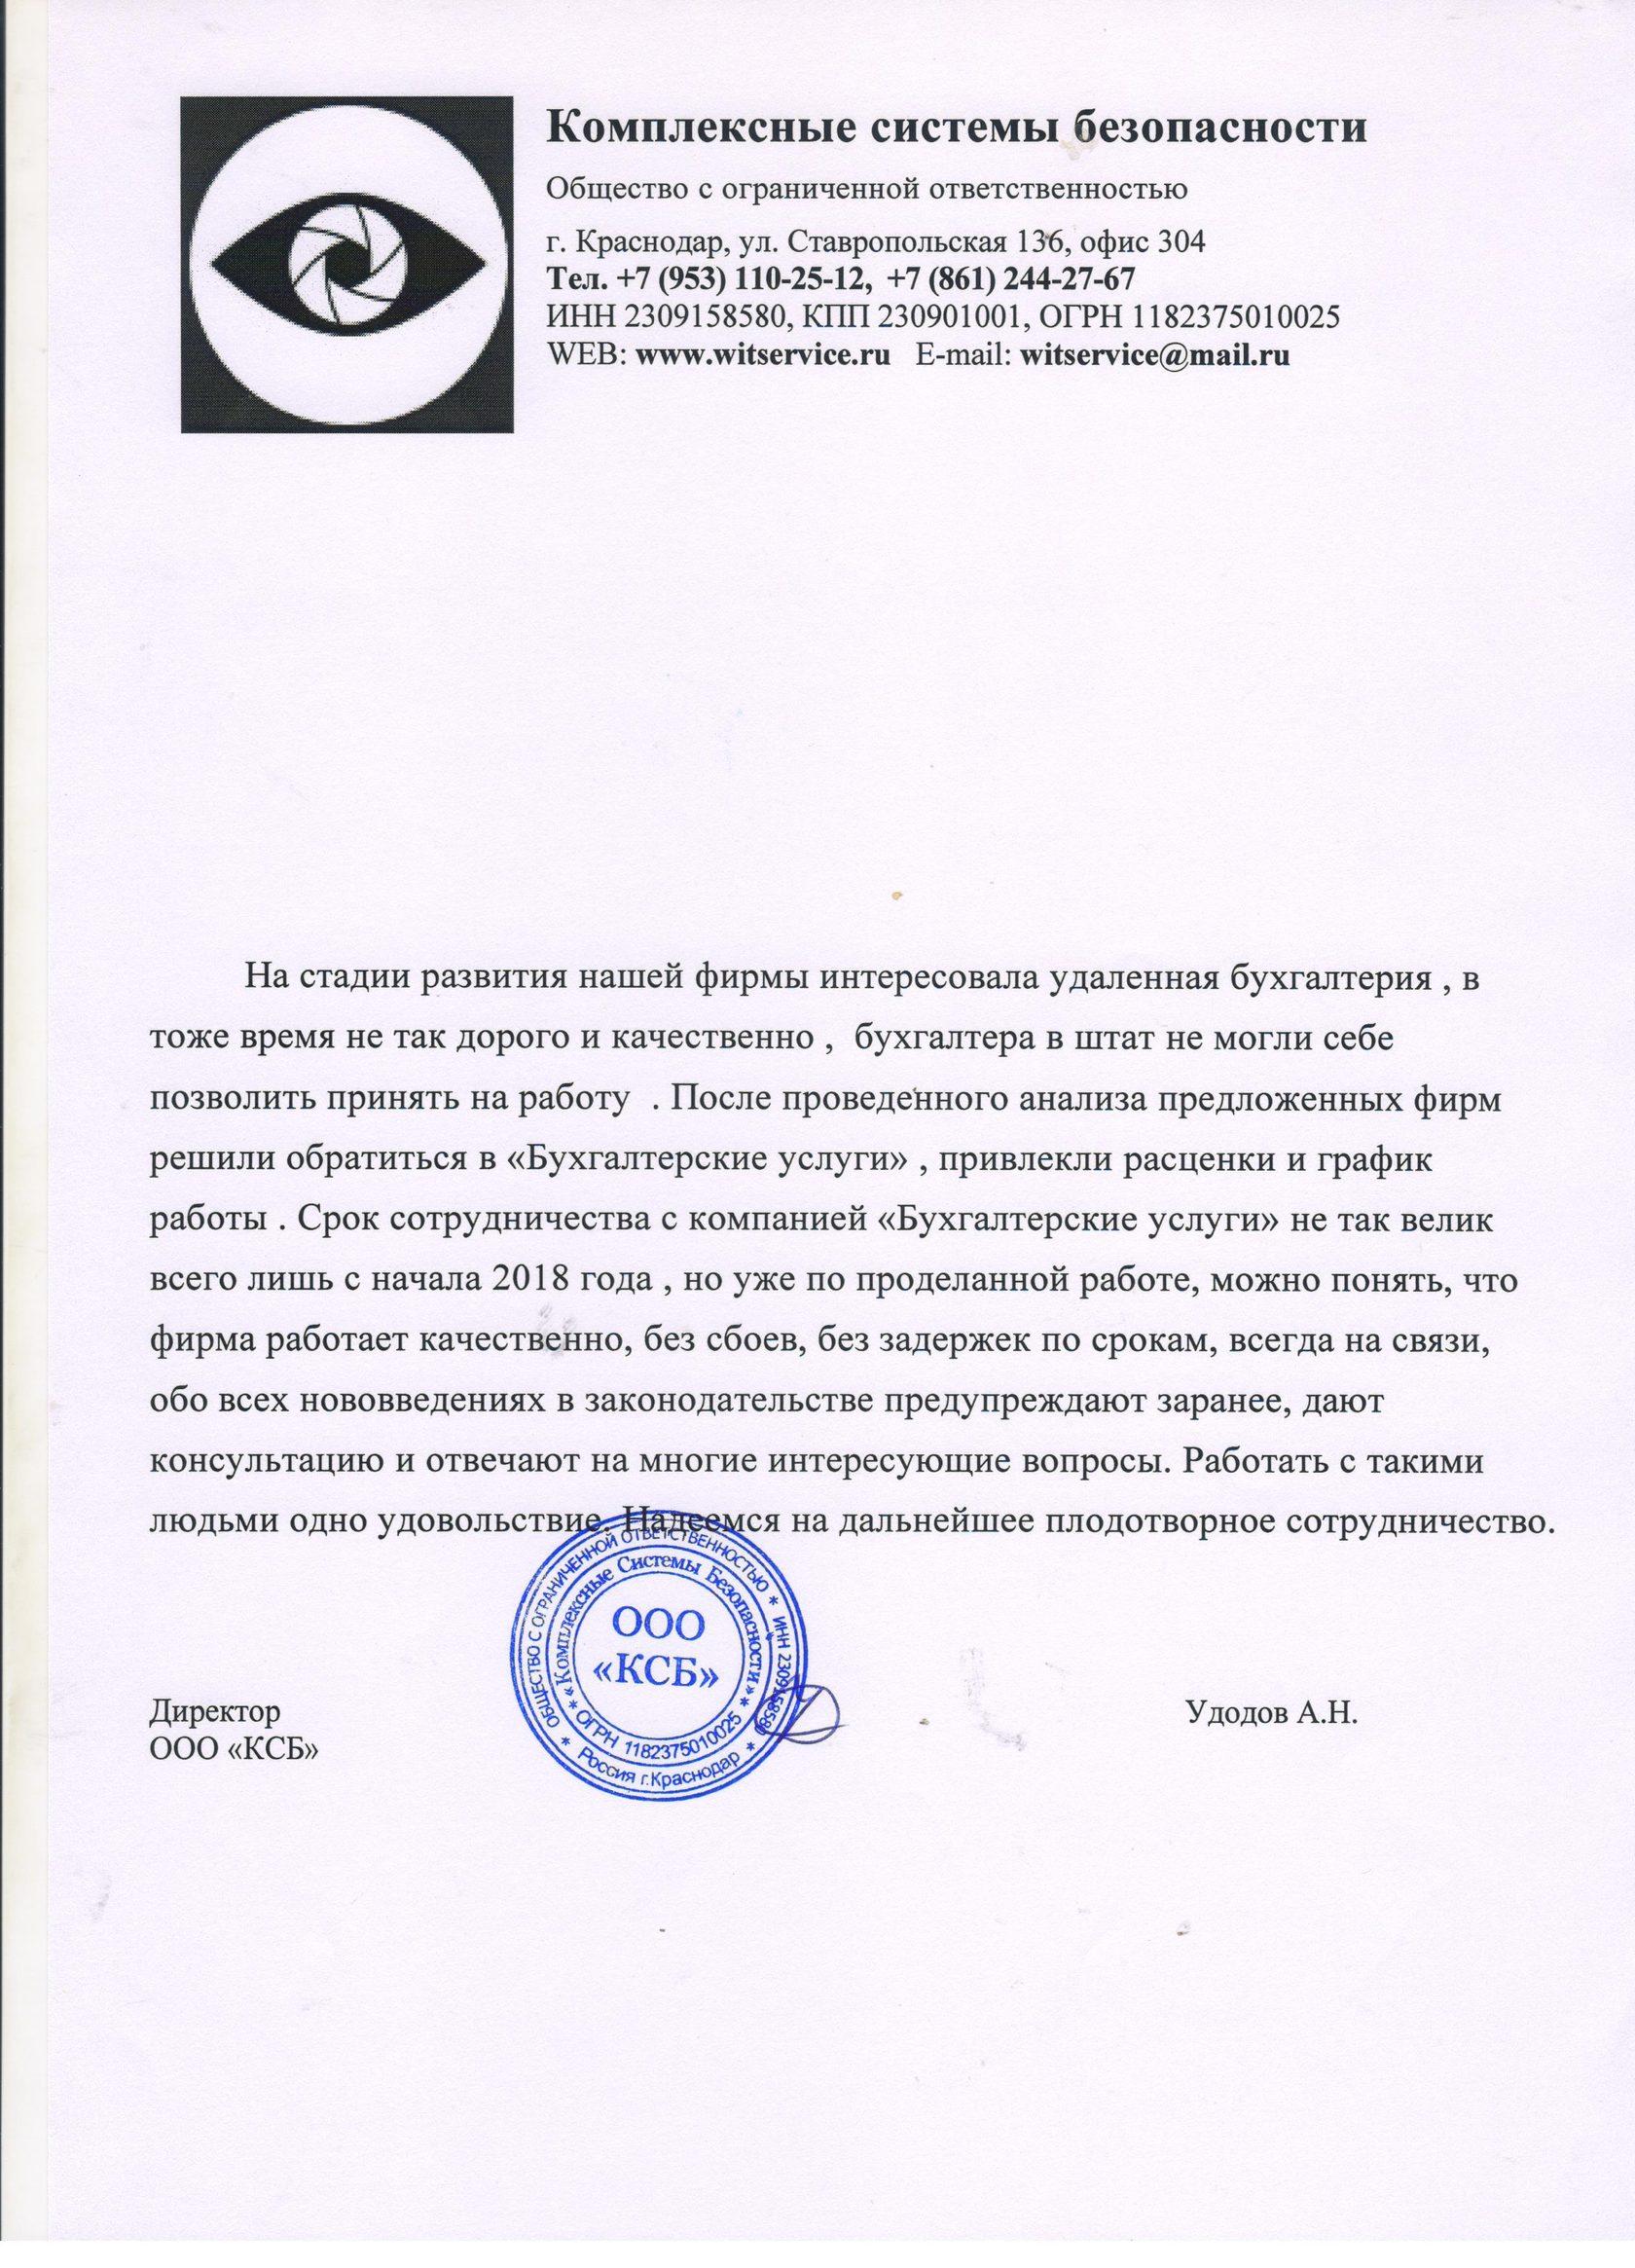 Краснодар консультации бухгалтера разработчики 1с бухгалтерия